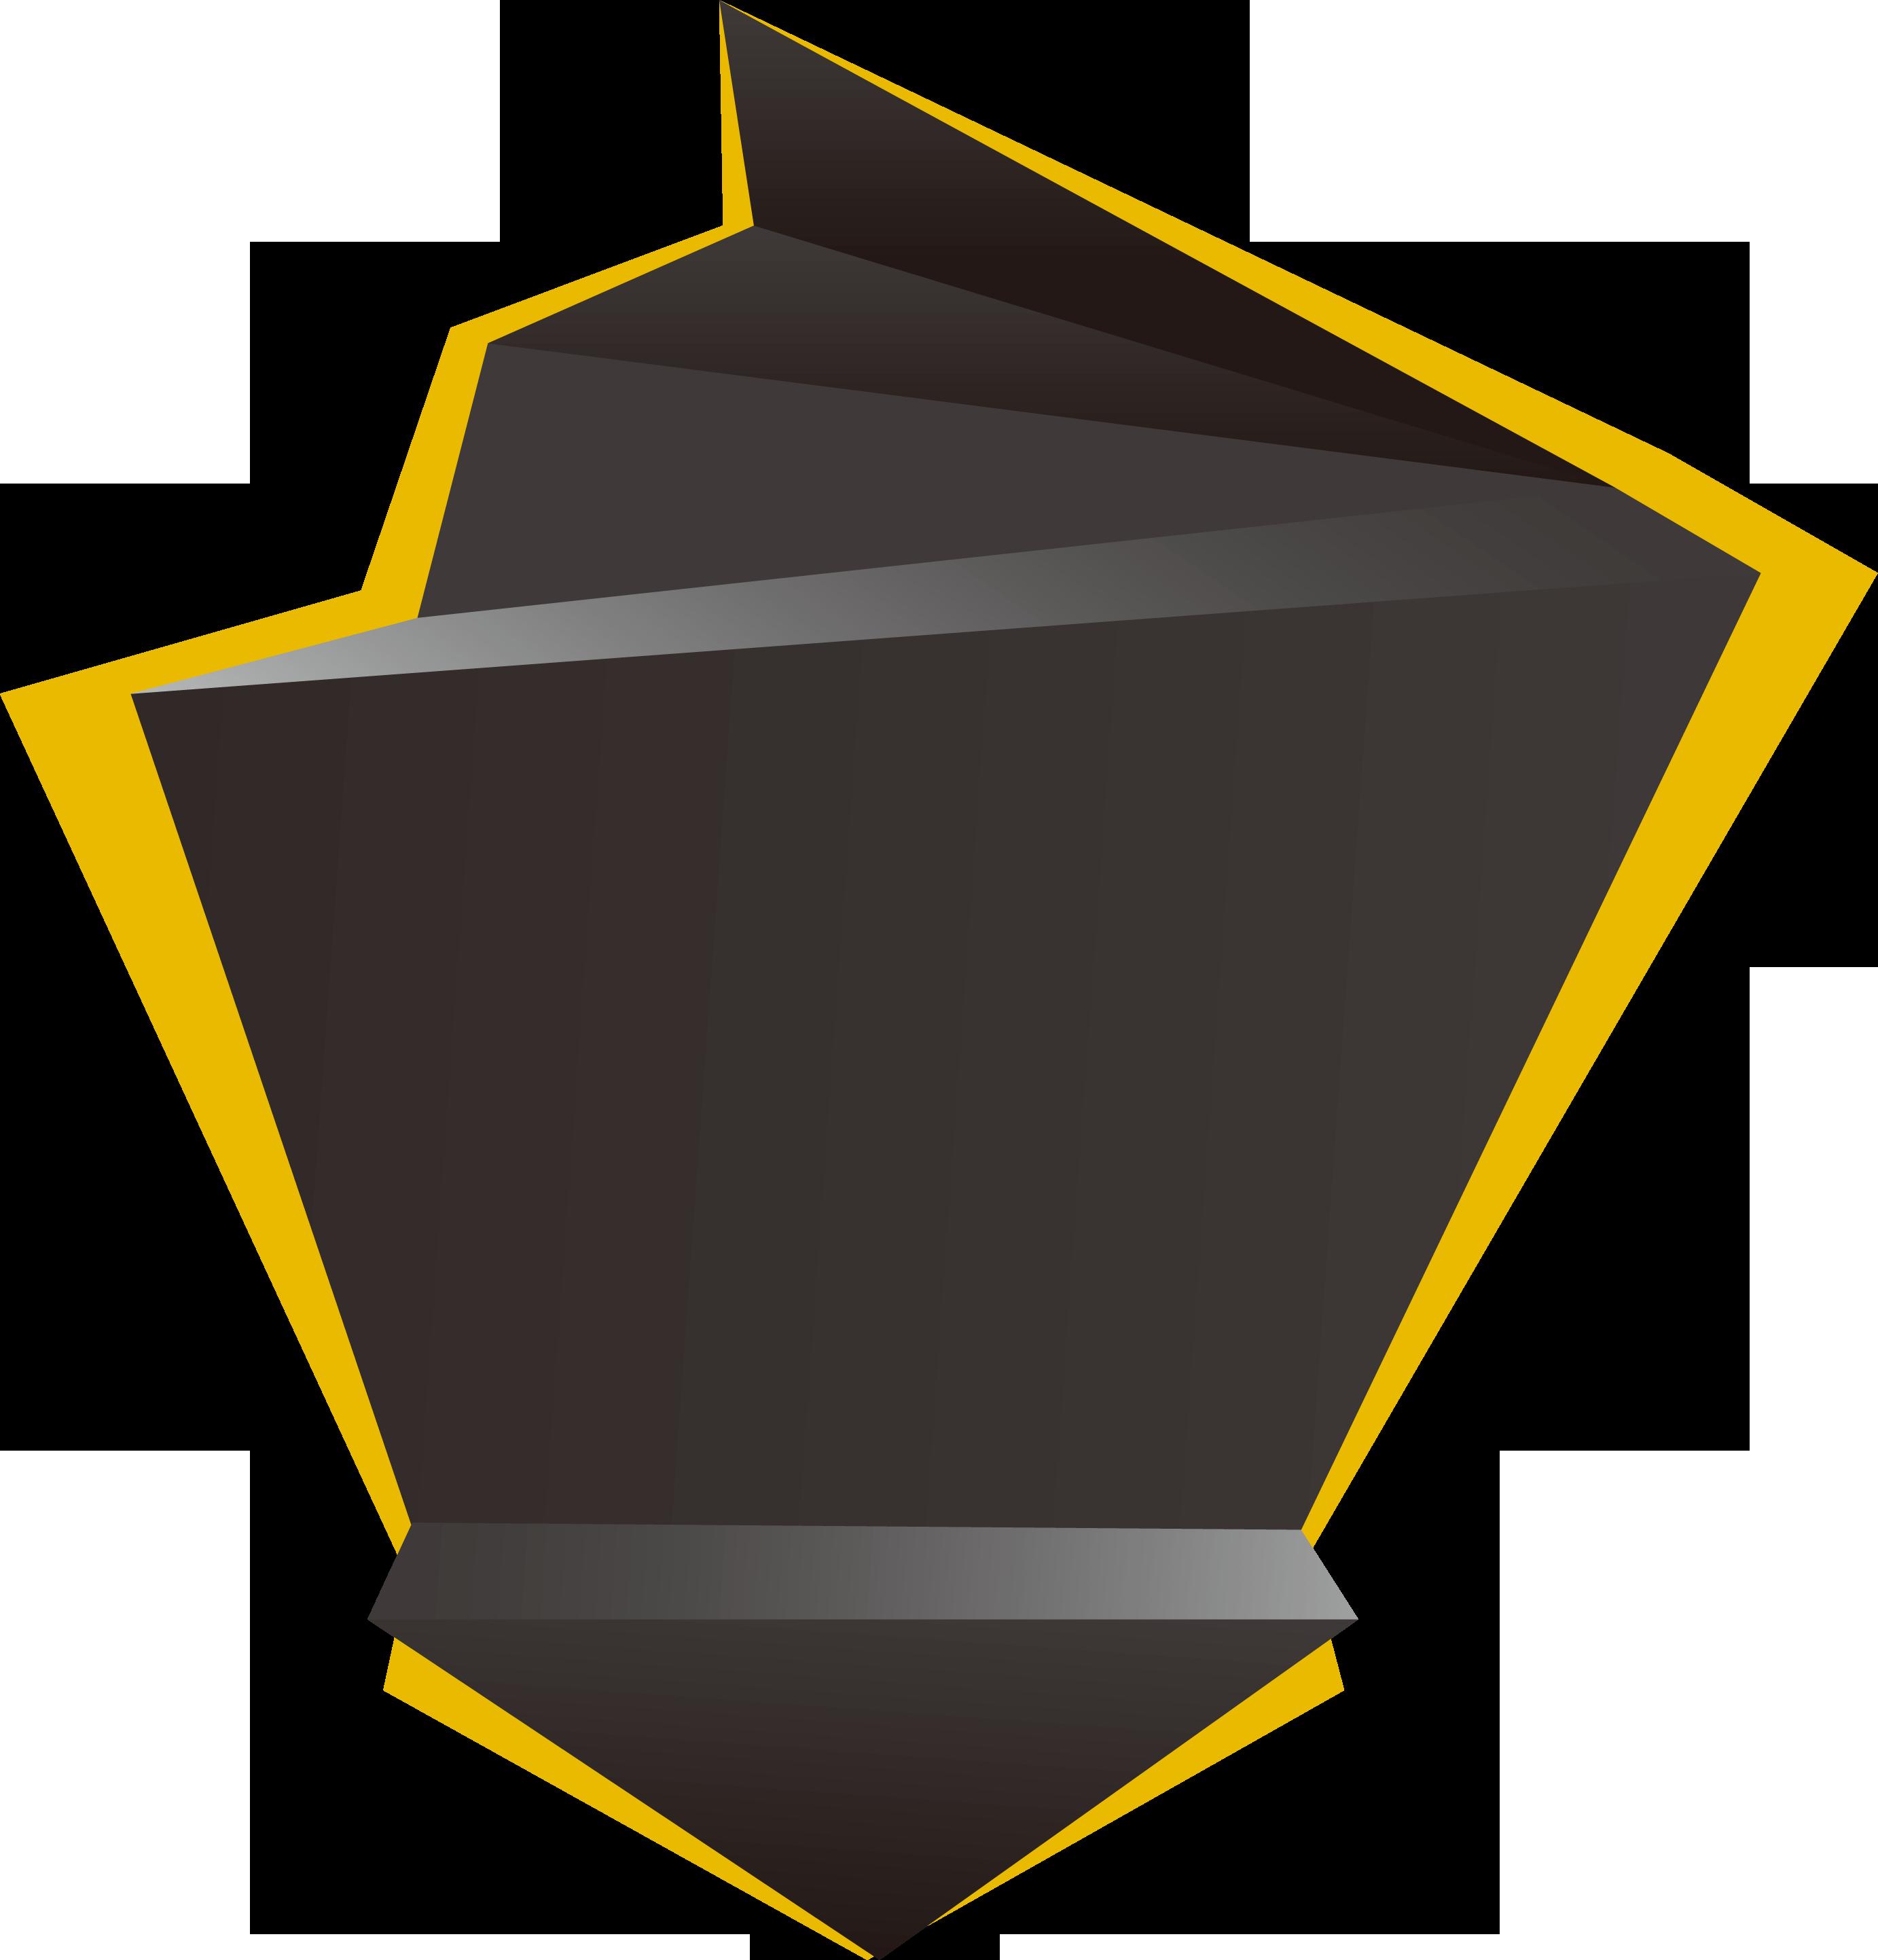 Triangular clipart geometric shape. Geometry creative custom yellow